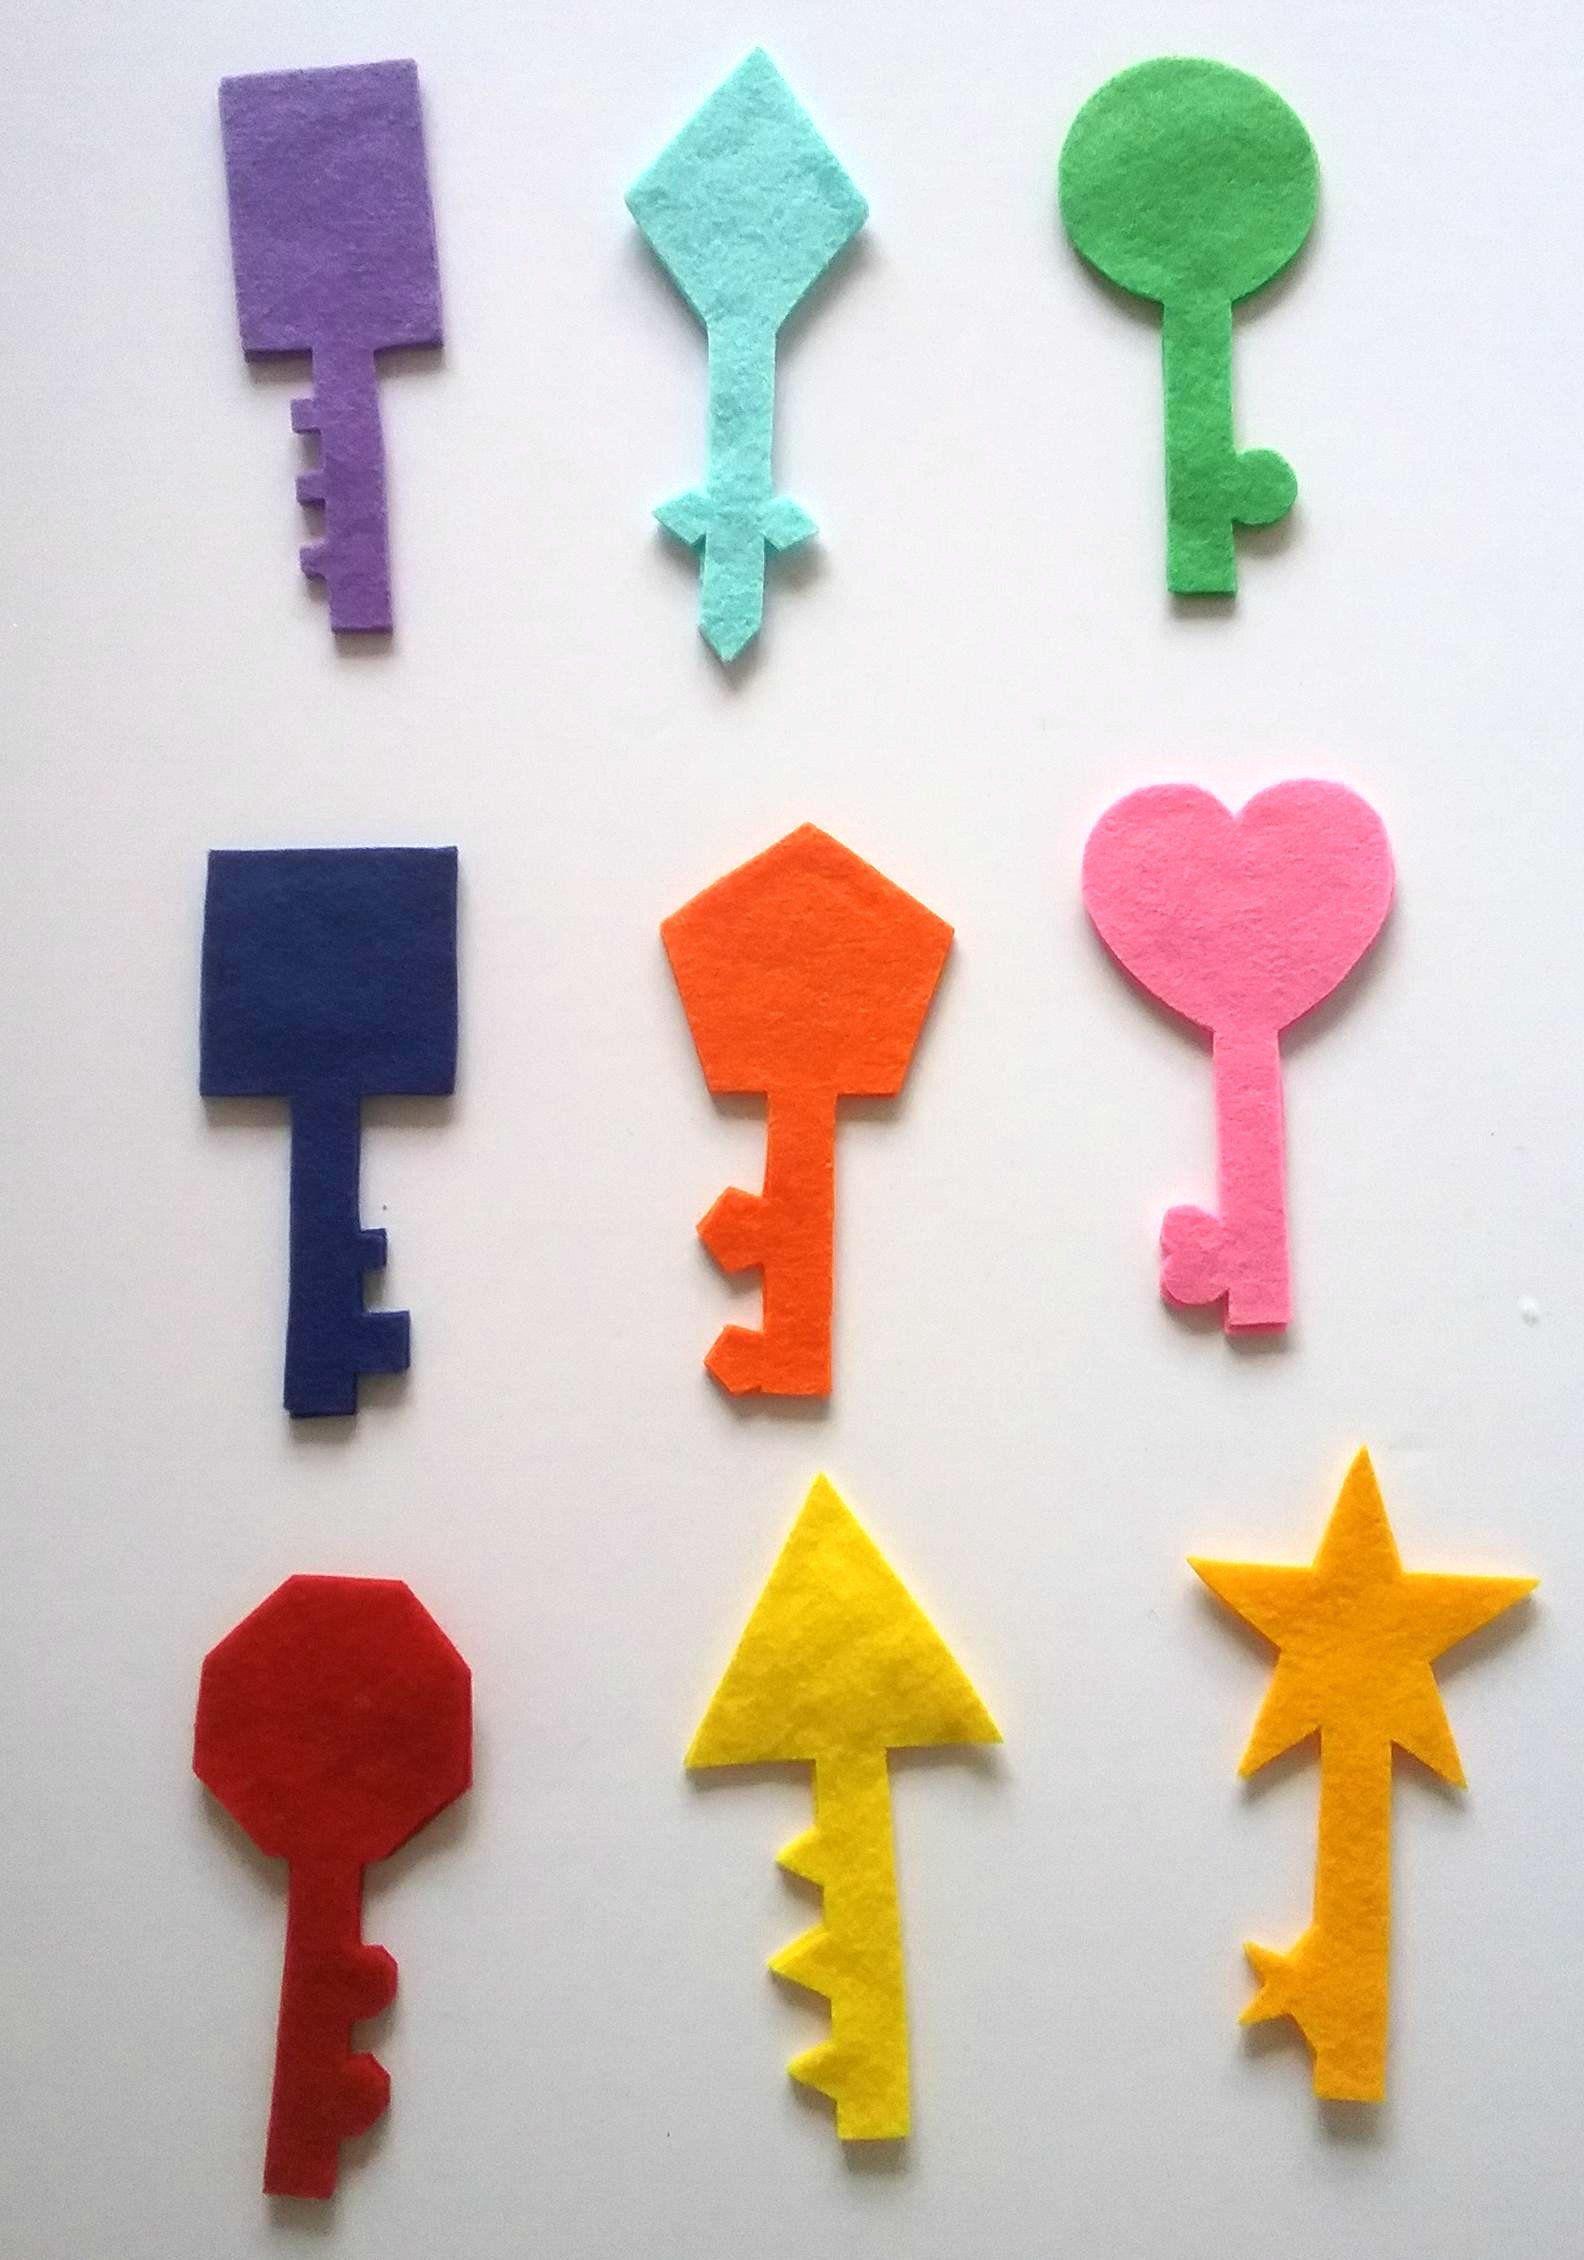 Key Shadow Matching Felt Board Set Colors Colours Shapes